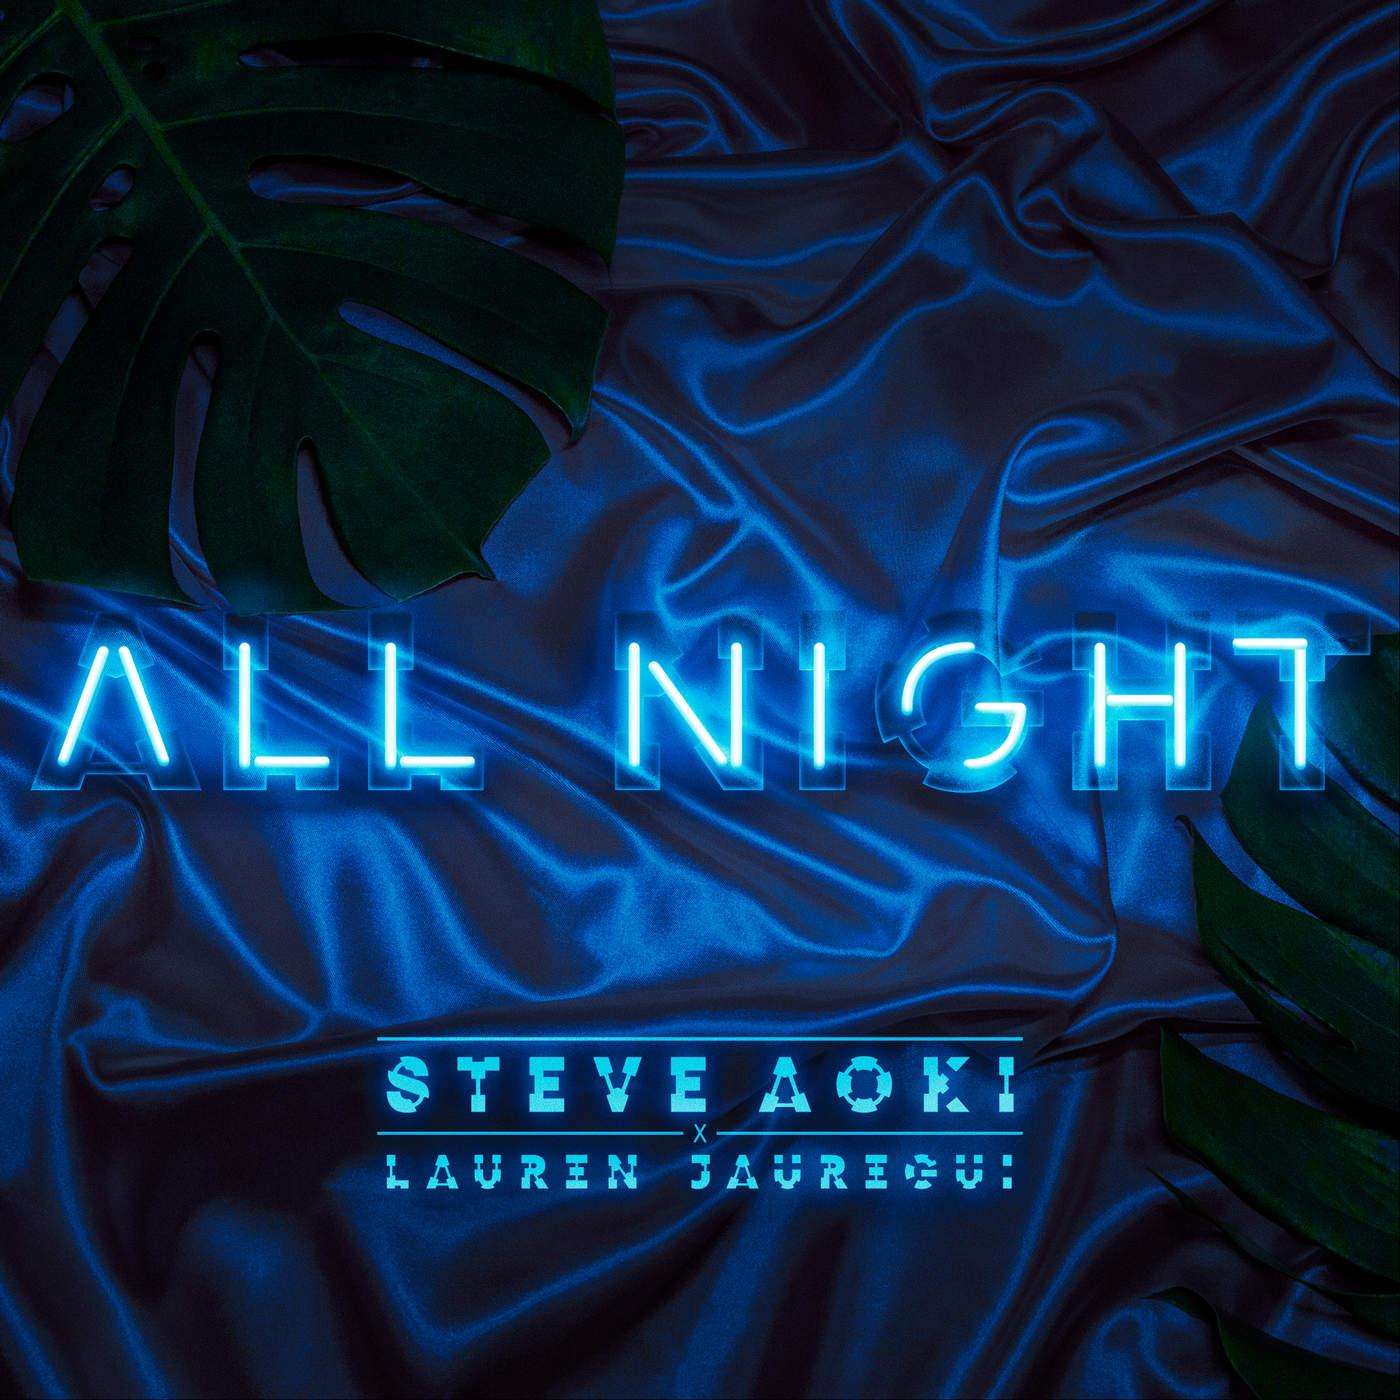 Steve Aoki & Lauren Jauregui - All Night - Single